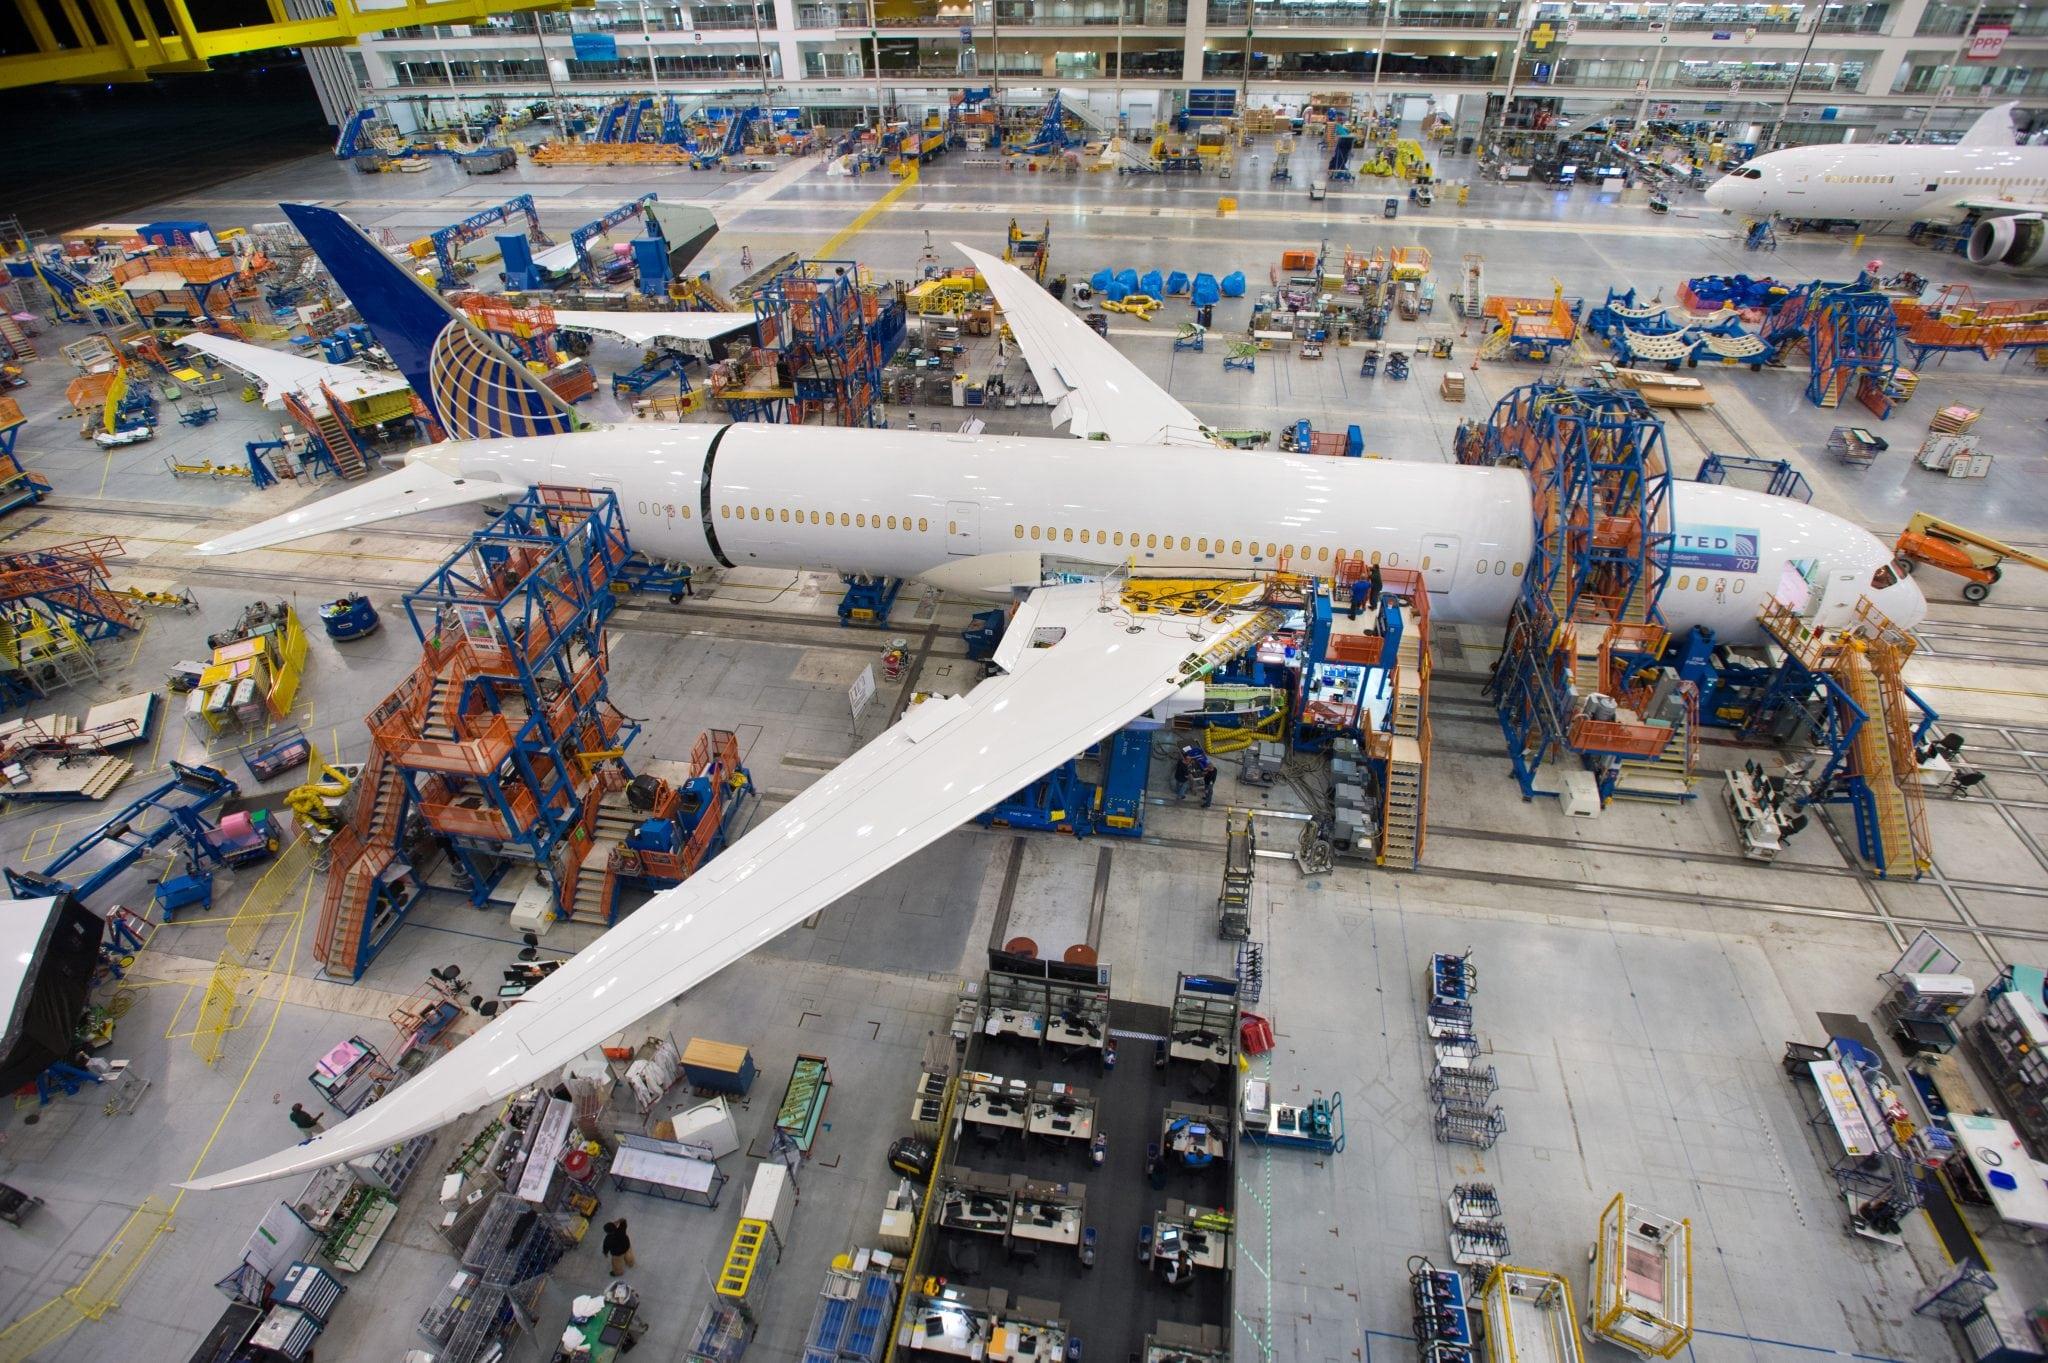 Assembly of the 787-9 Dreamliner at the South Carolina facility